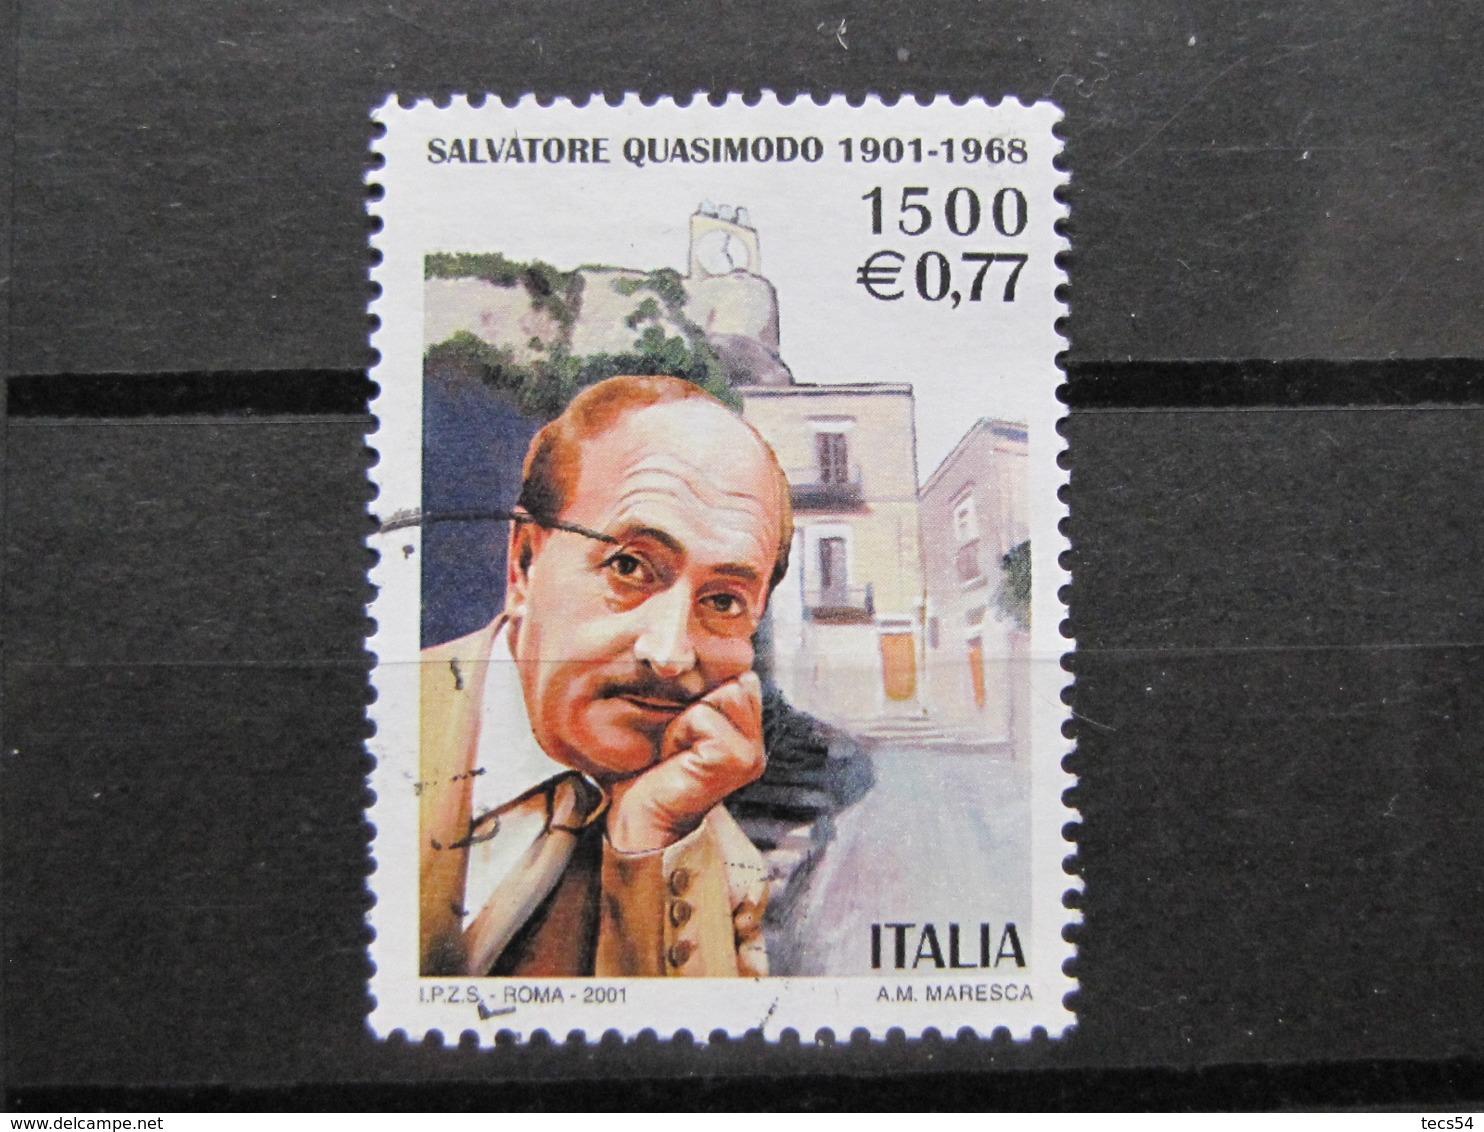 *ITALIA* USATI 2001 - CENT QUASIMODO - SASSONE 2555 - LUSSO/FIOR DI STAMPA - 6. 1946-.. Repubblica